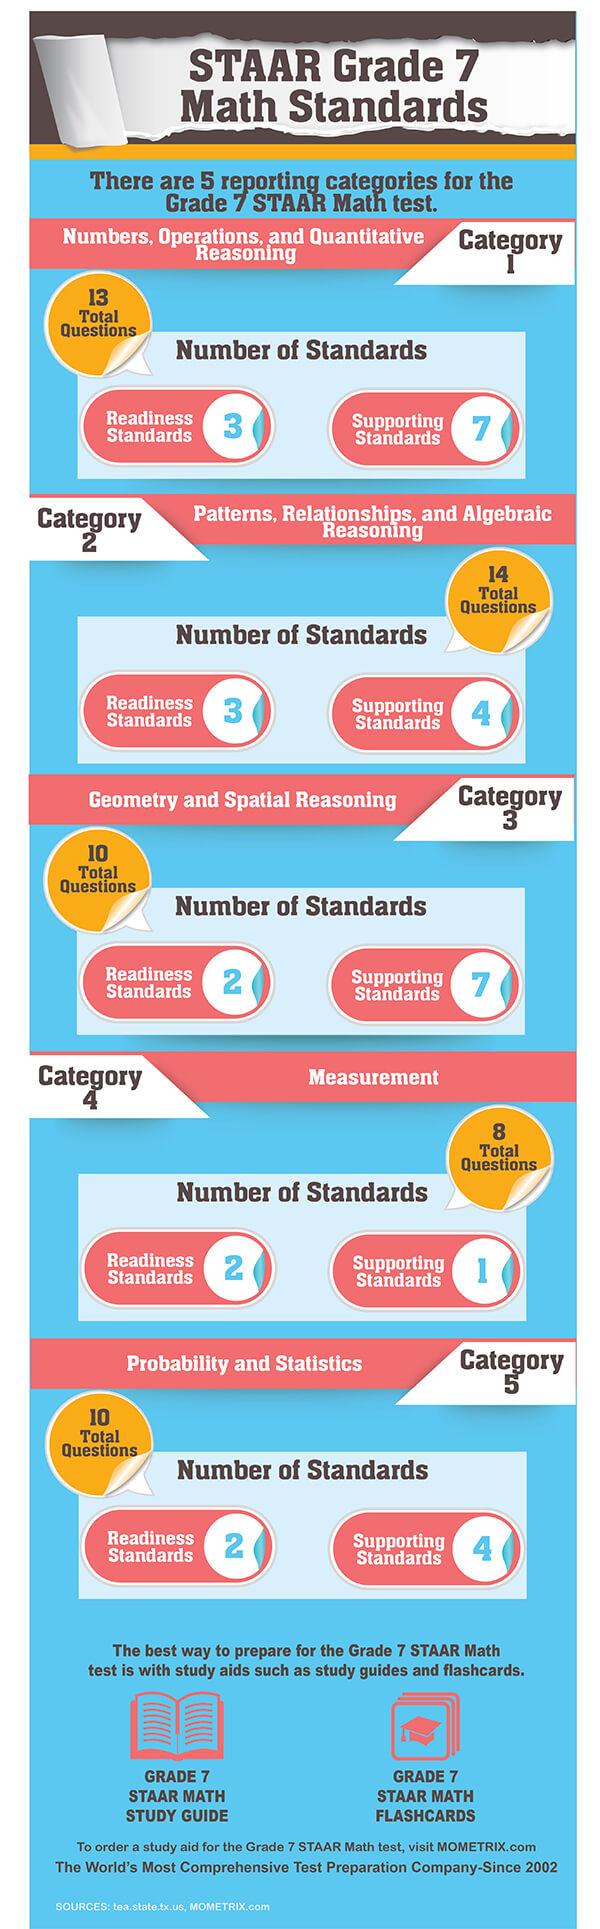 Free STAAR Grade 7 Mathematics Practice Test Questions